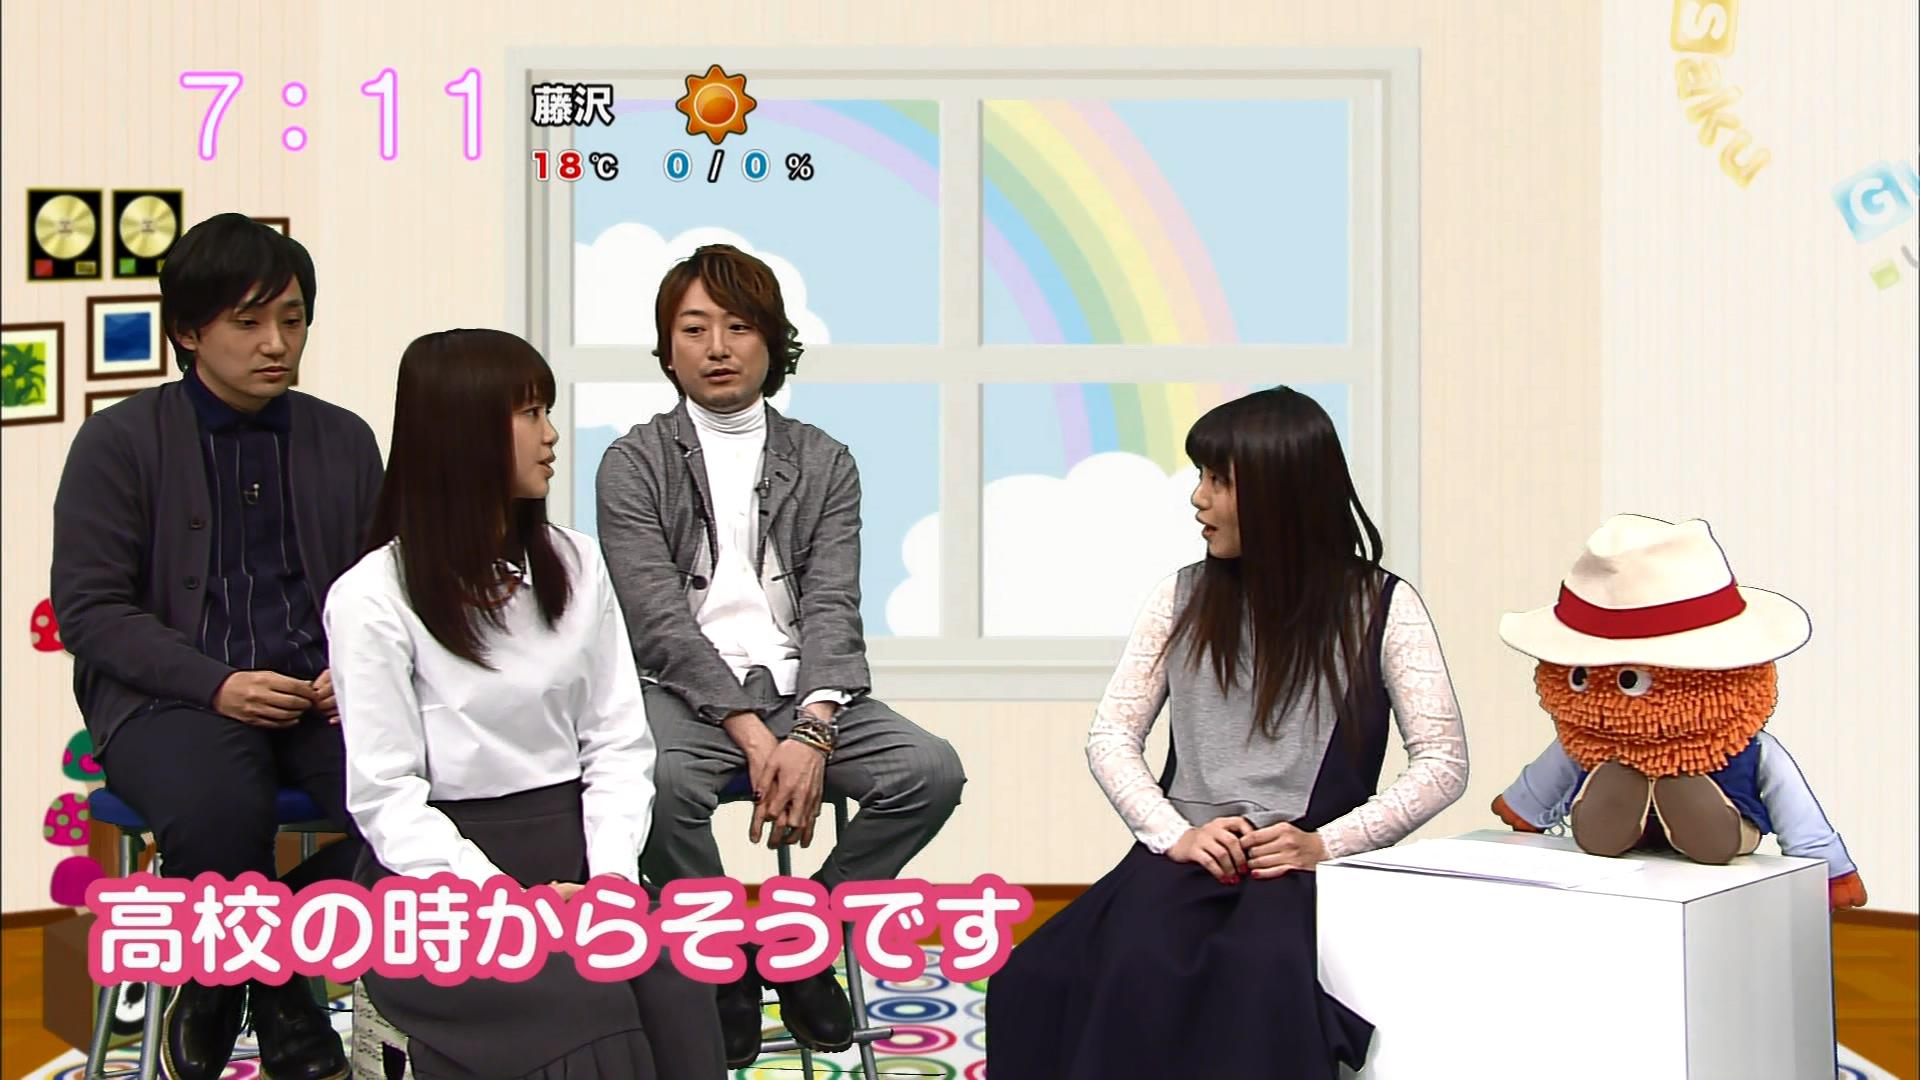 2016.03.17 いきものがかり(saku saku).ts_20160317_081216.317